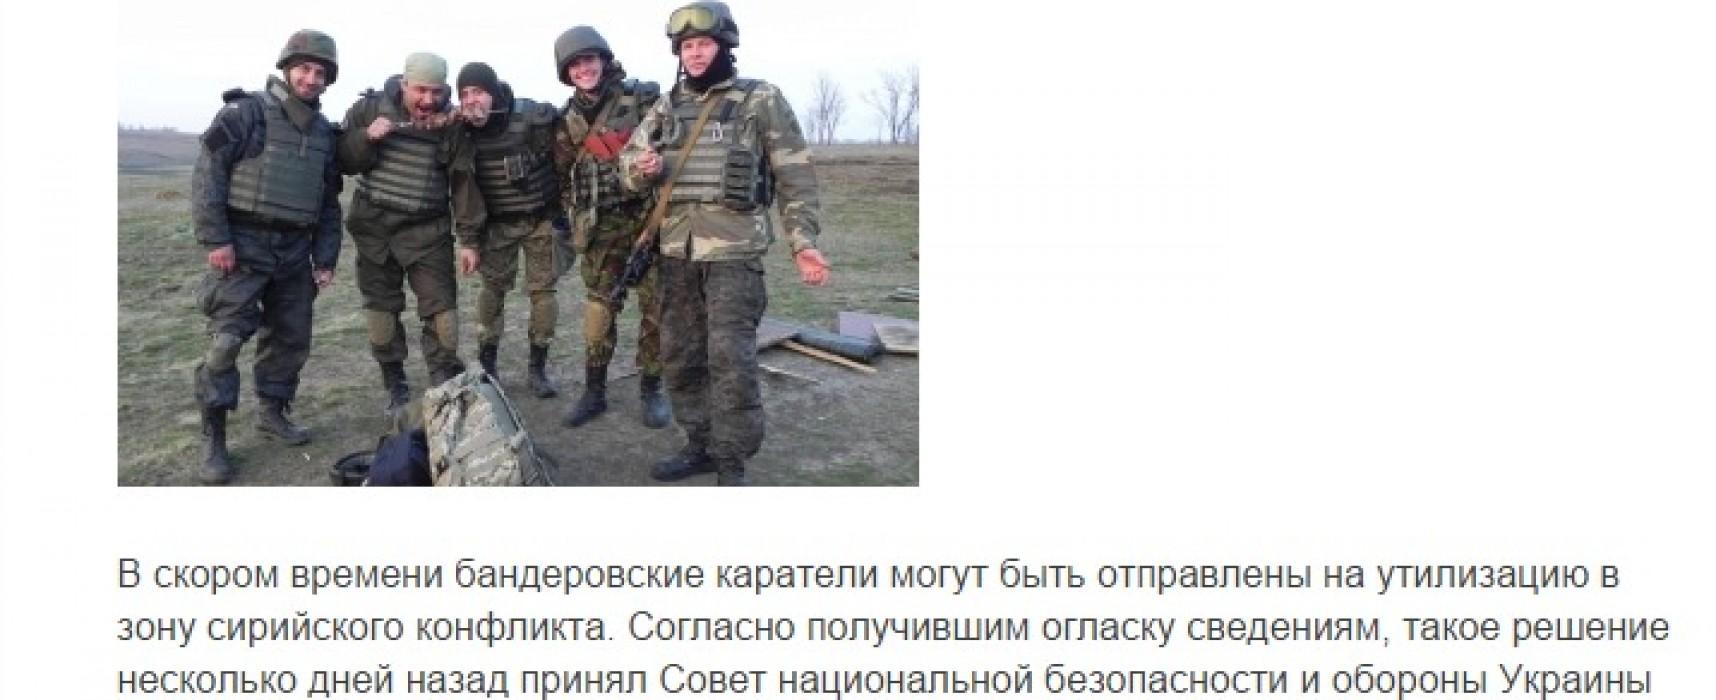 Fake: Ukrainians to Participate in Syrian War